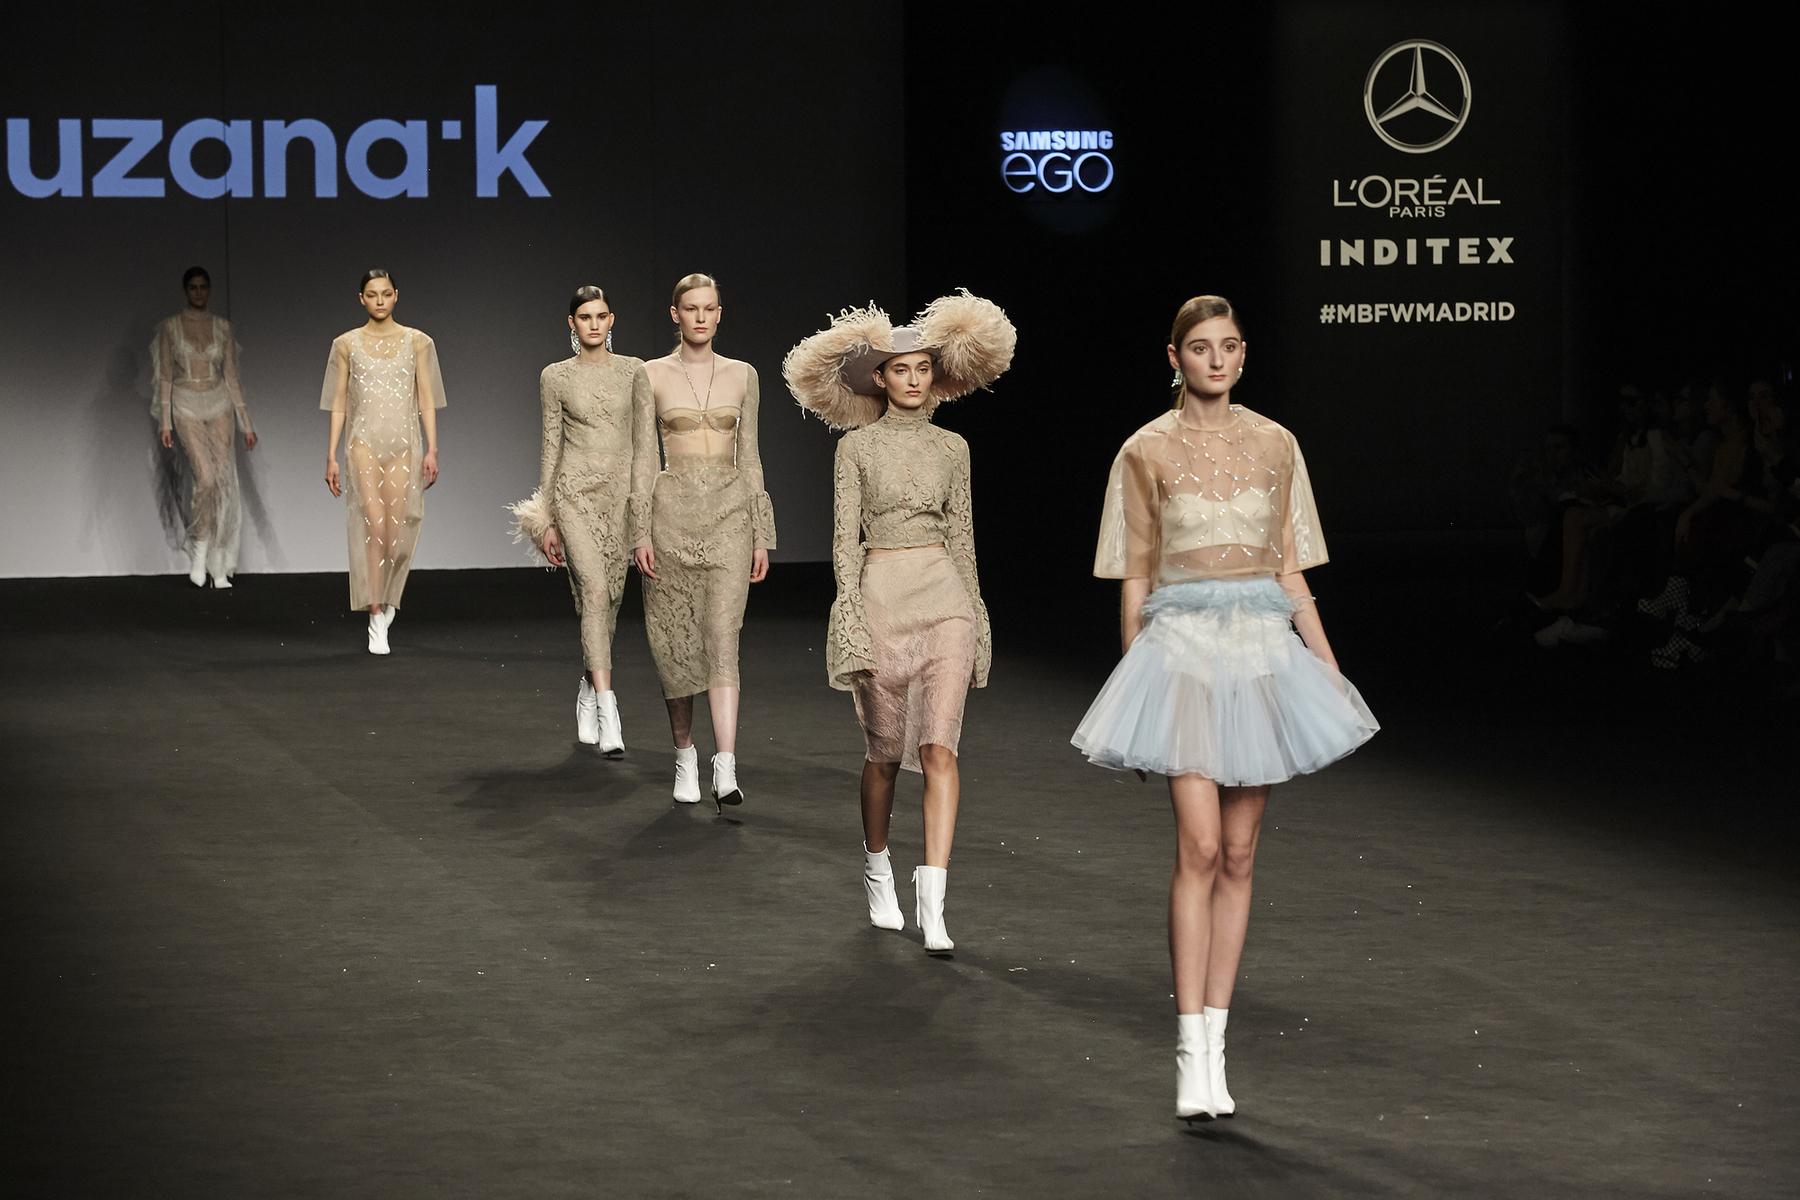 Kolekce Couture 2019 představena v Madridu